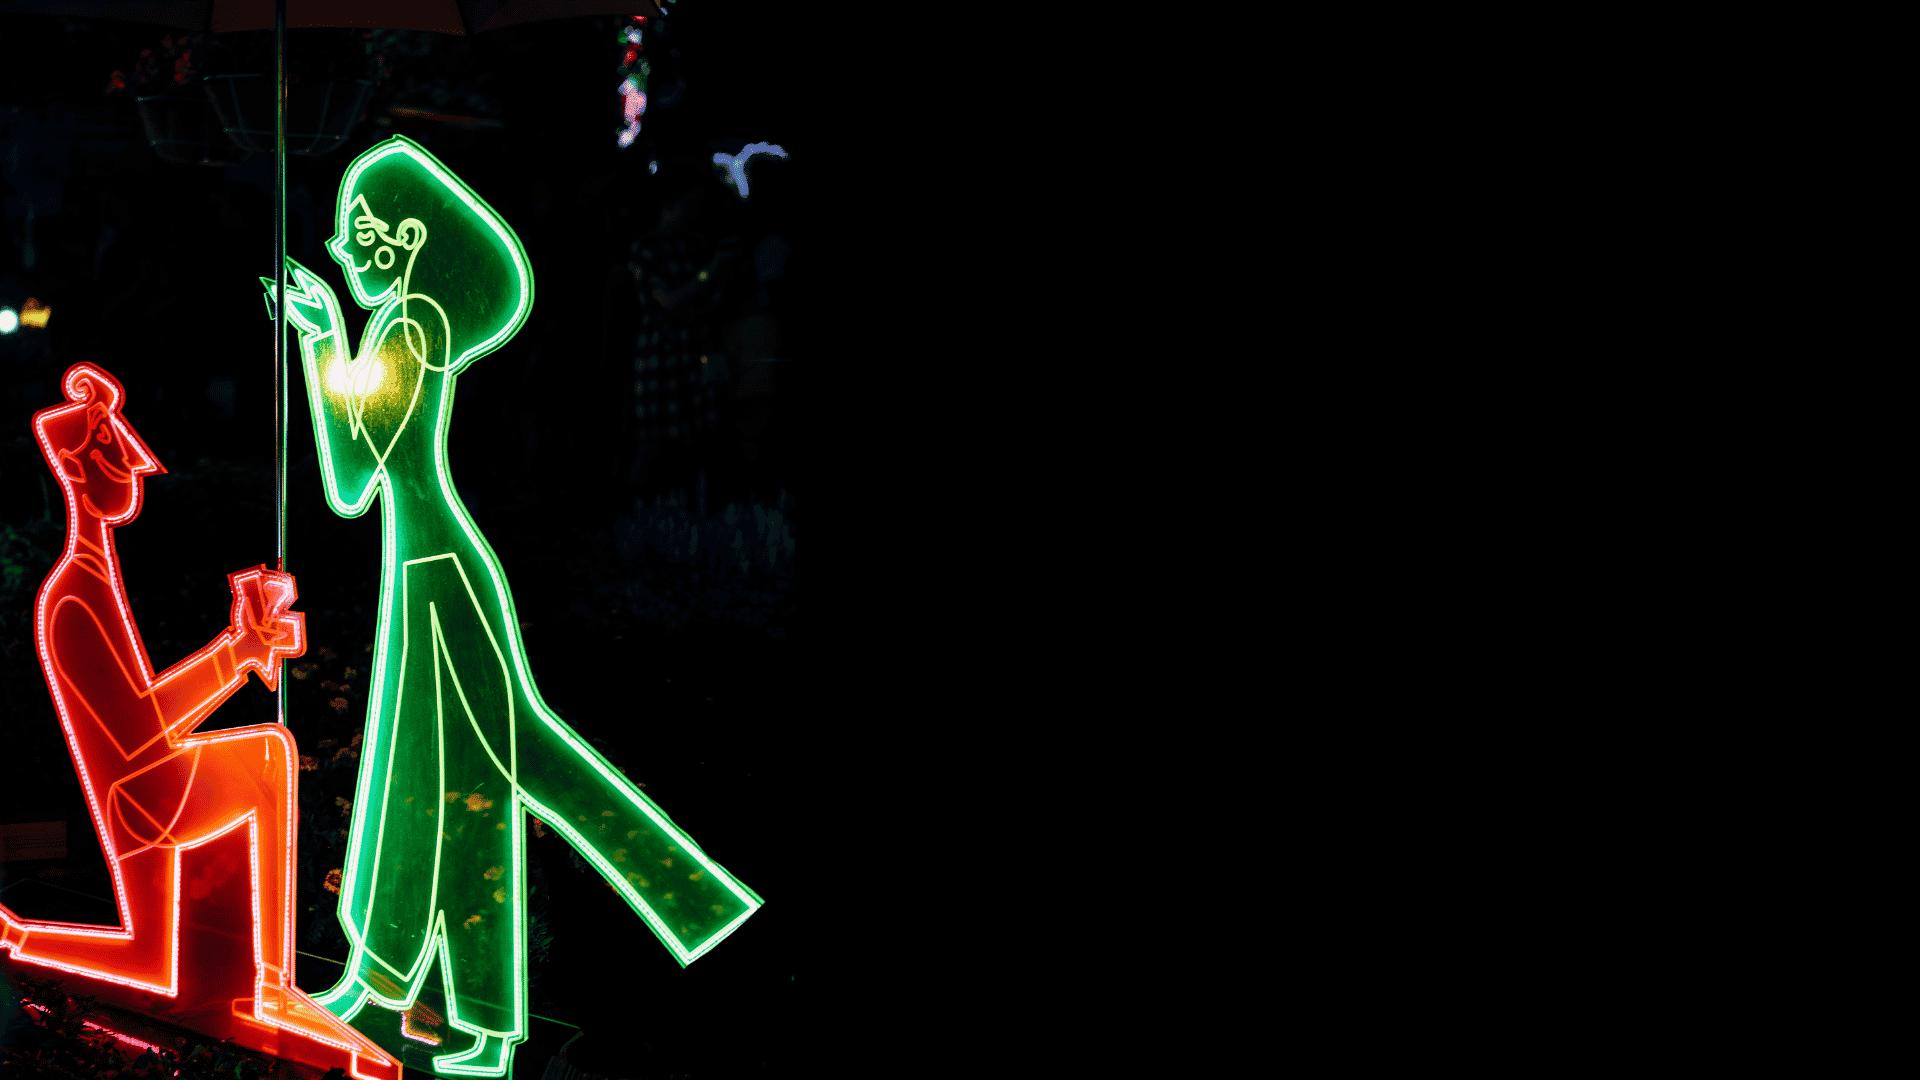 neon light man proposing to woman